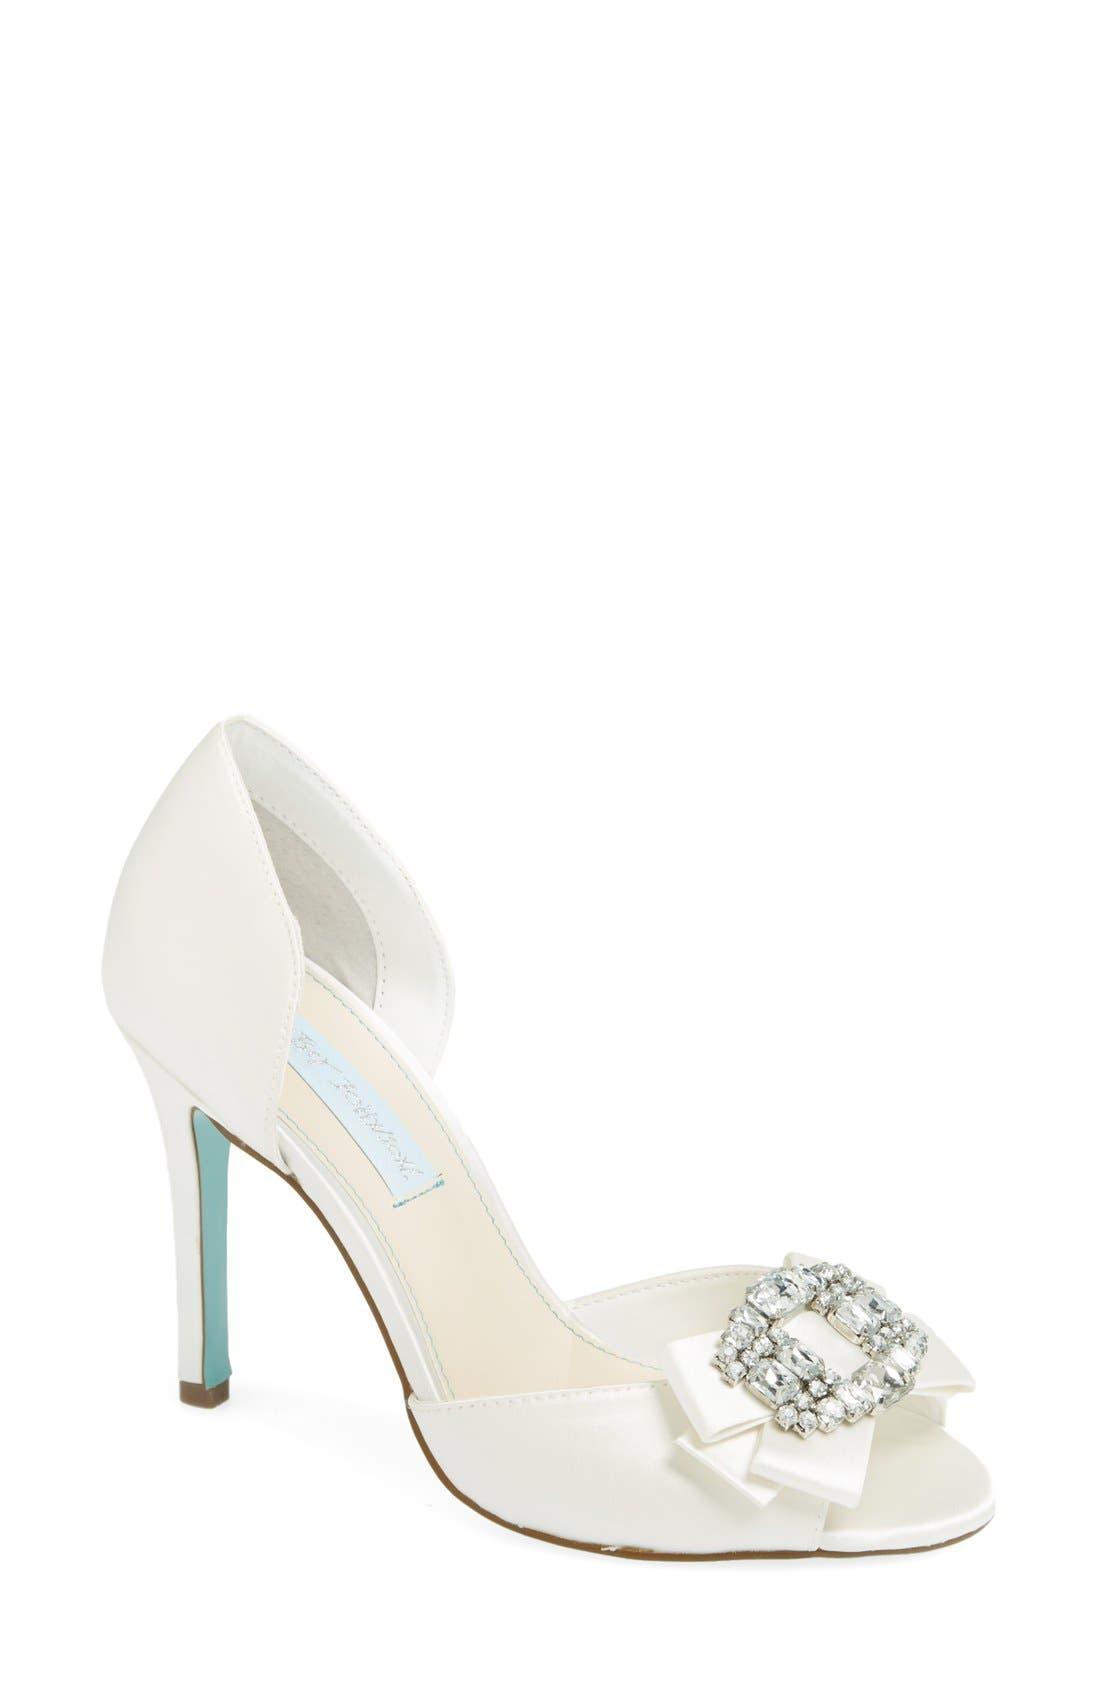 Main Image - Betsey Johnson 'Glam' Sandal